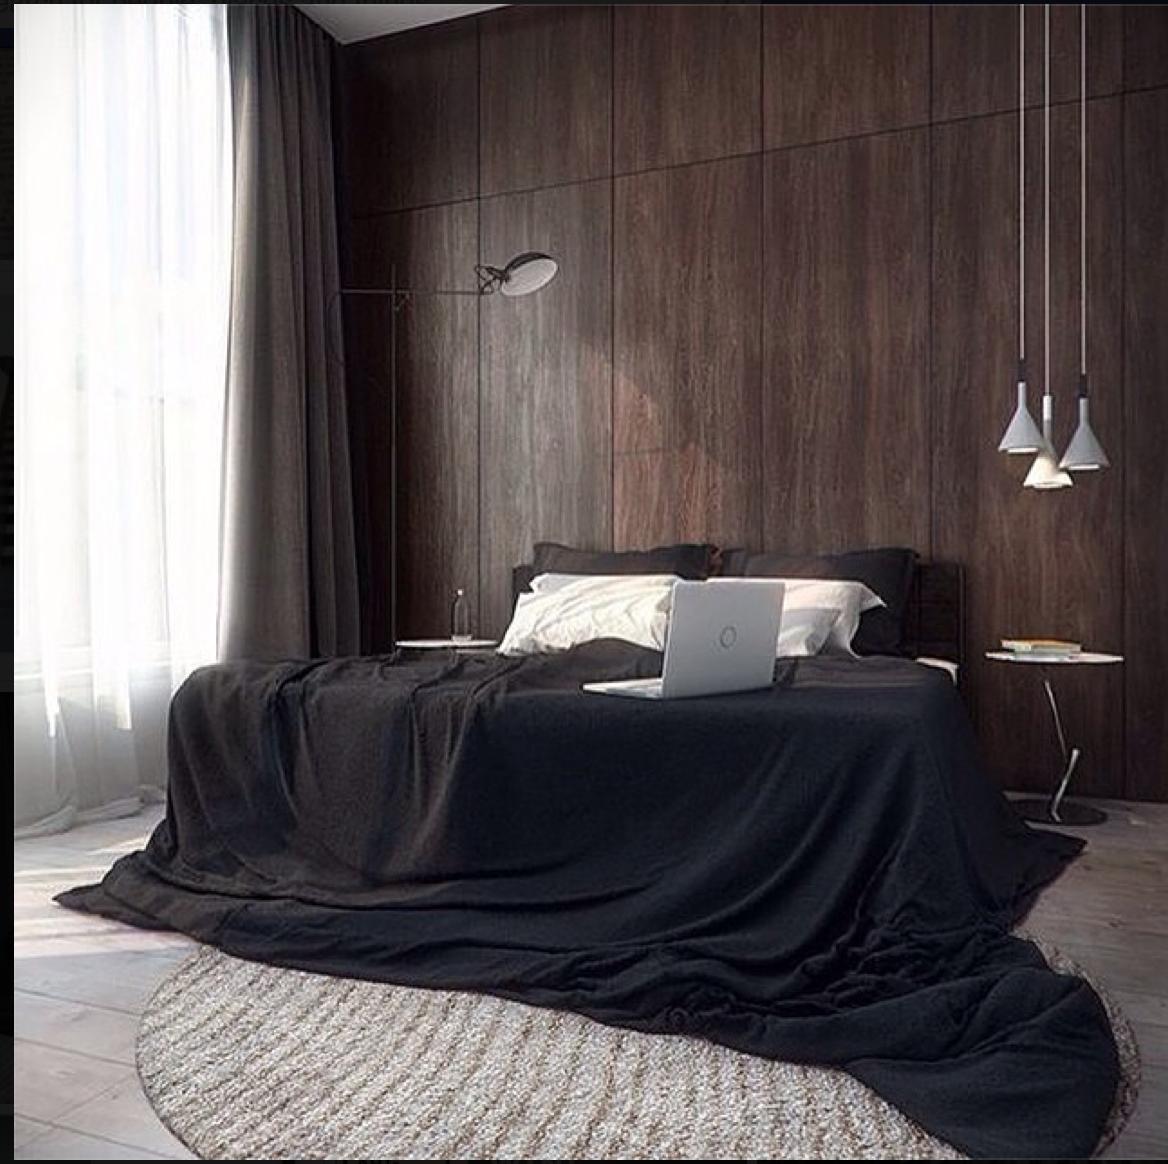 textures bedrooms pinterest schlafzimmer rund. Black Bedroom Furniture Sets. Home Design Ideas